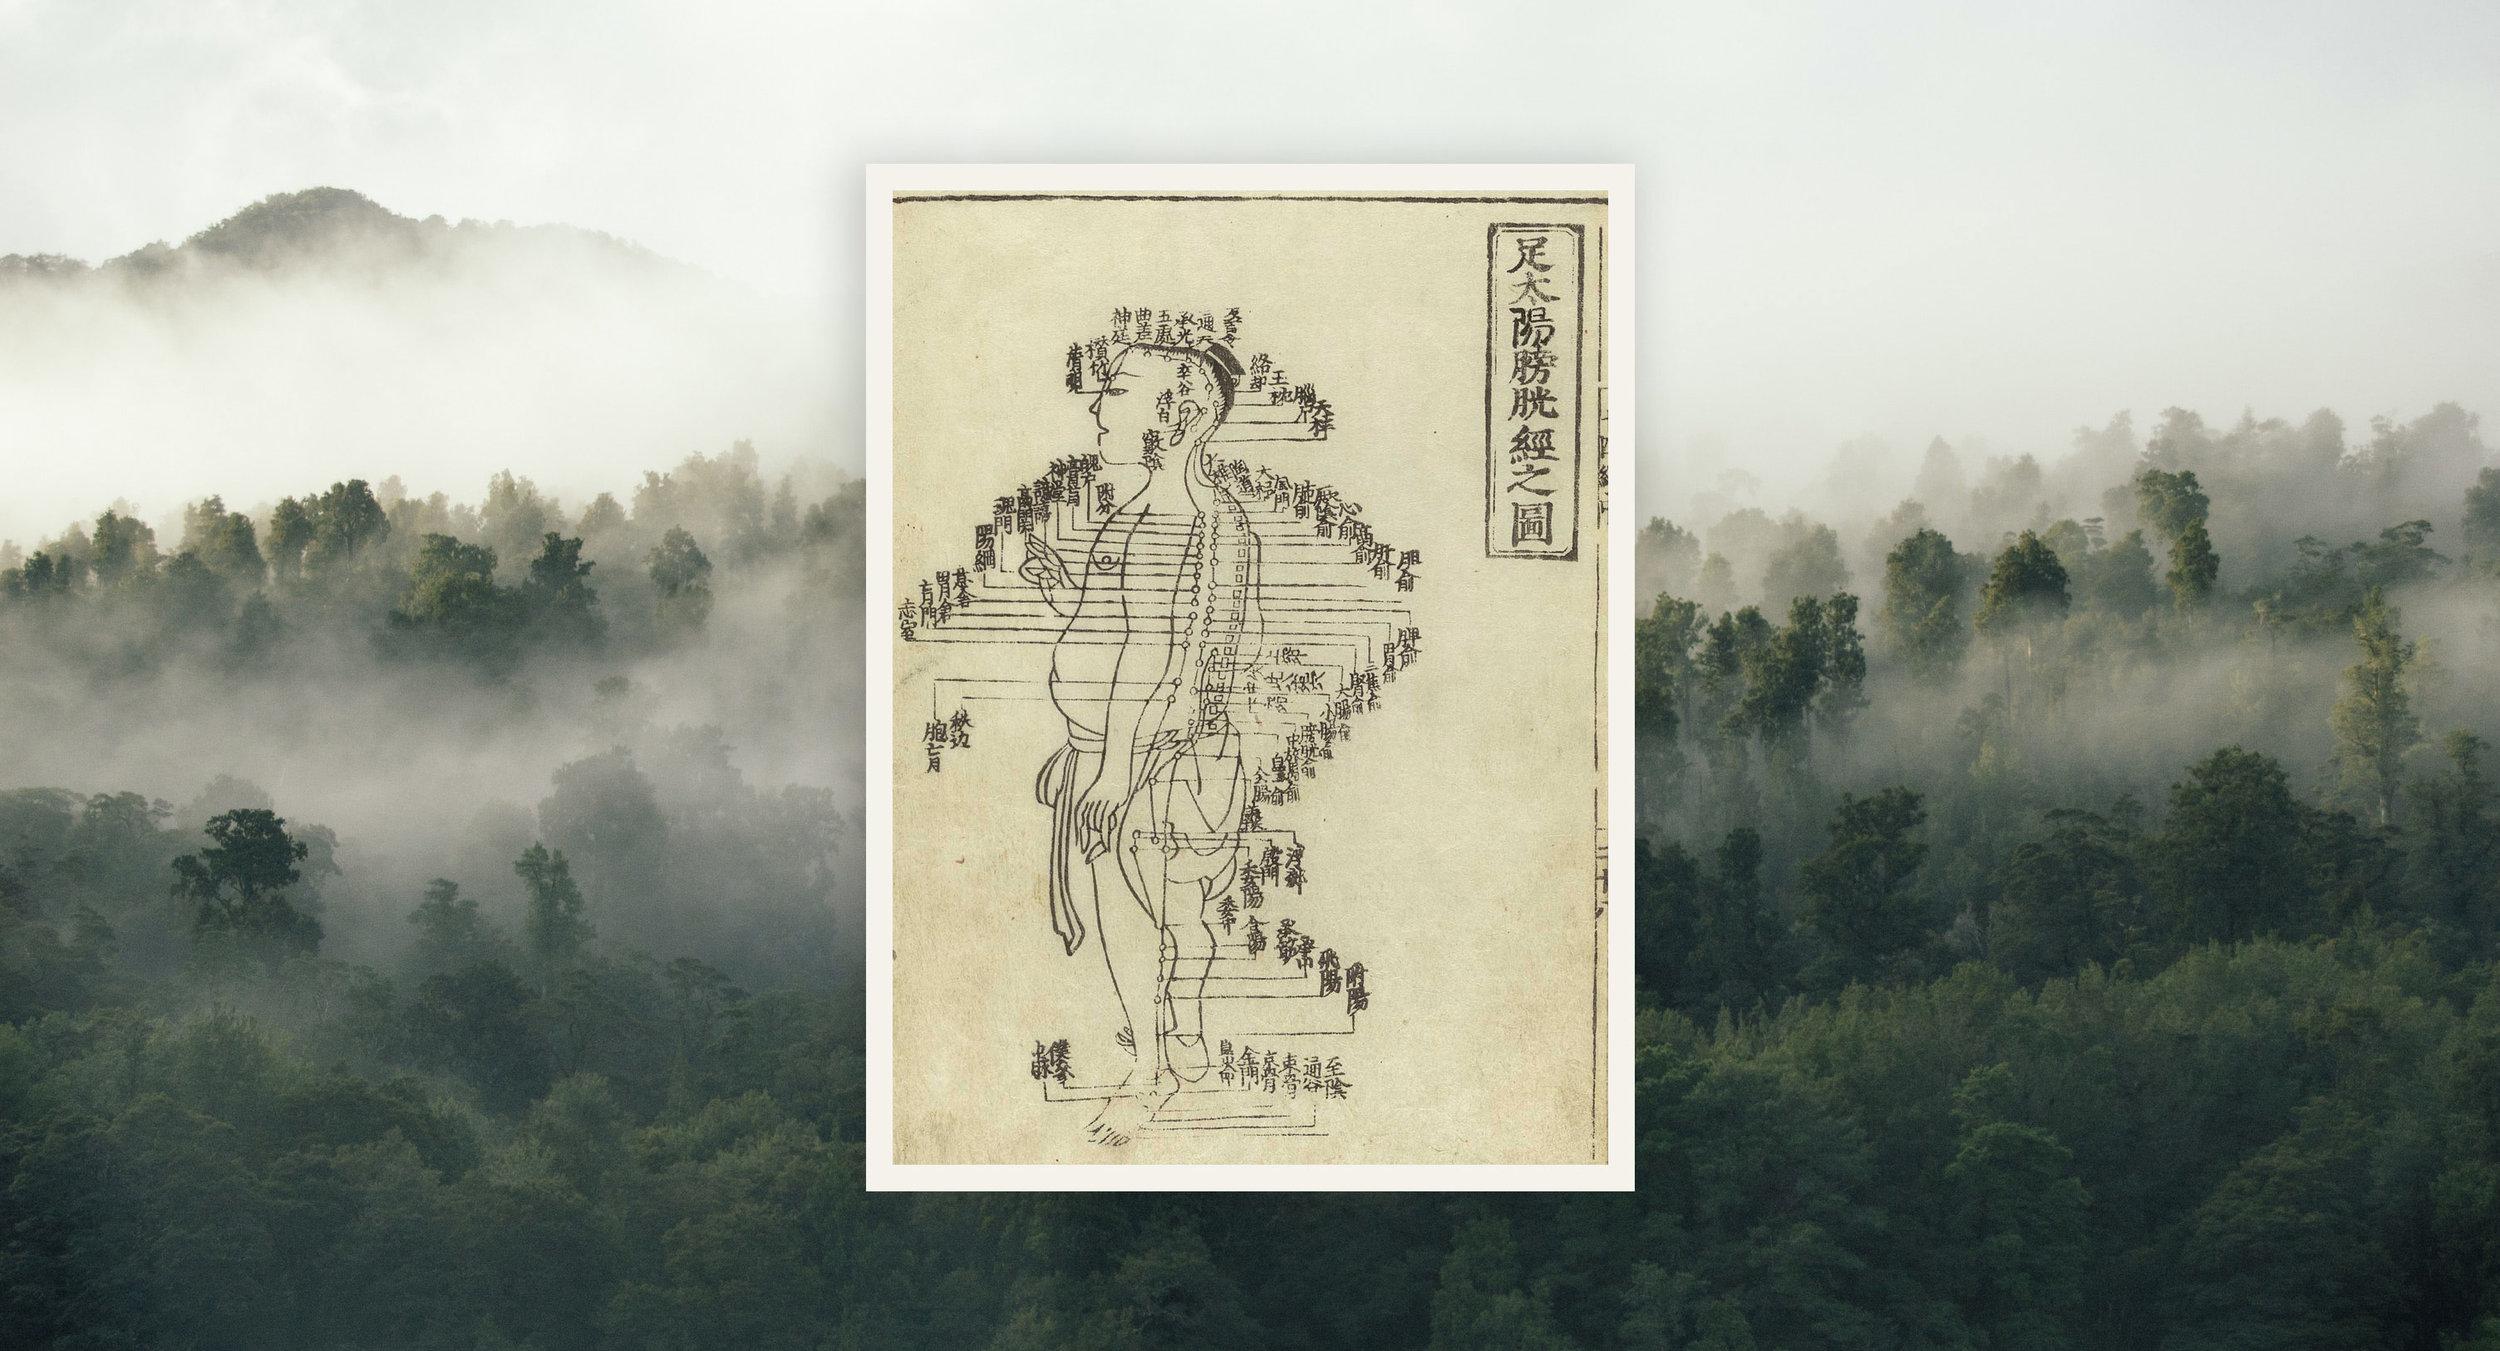 Acupuncture chart from Hua Shou (fl. 1340s, Yuan Dynasty). This image from Shi si jing fa hui (Expression of the Fourteen Meridians). (Tokyo: Suharaya Heisuke kanko, Kyoho gan 1716).